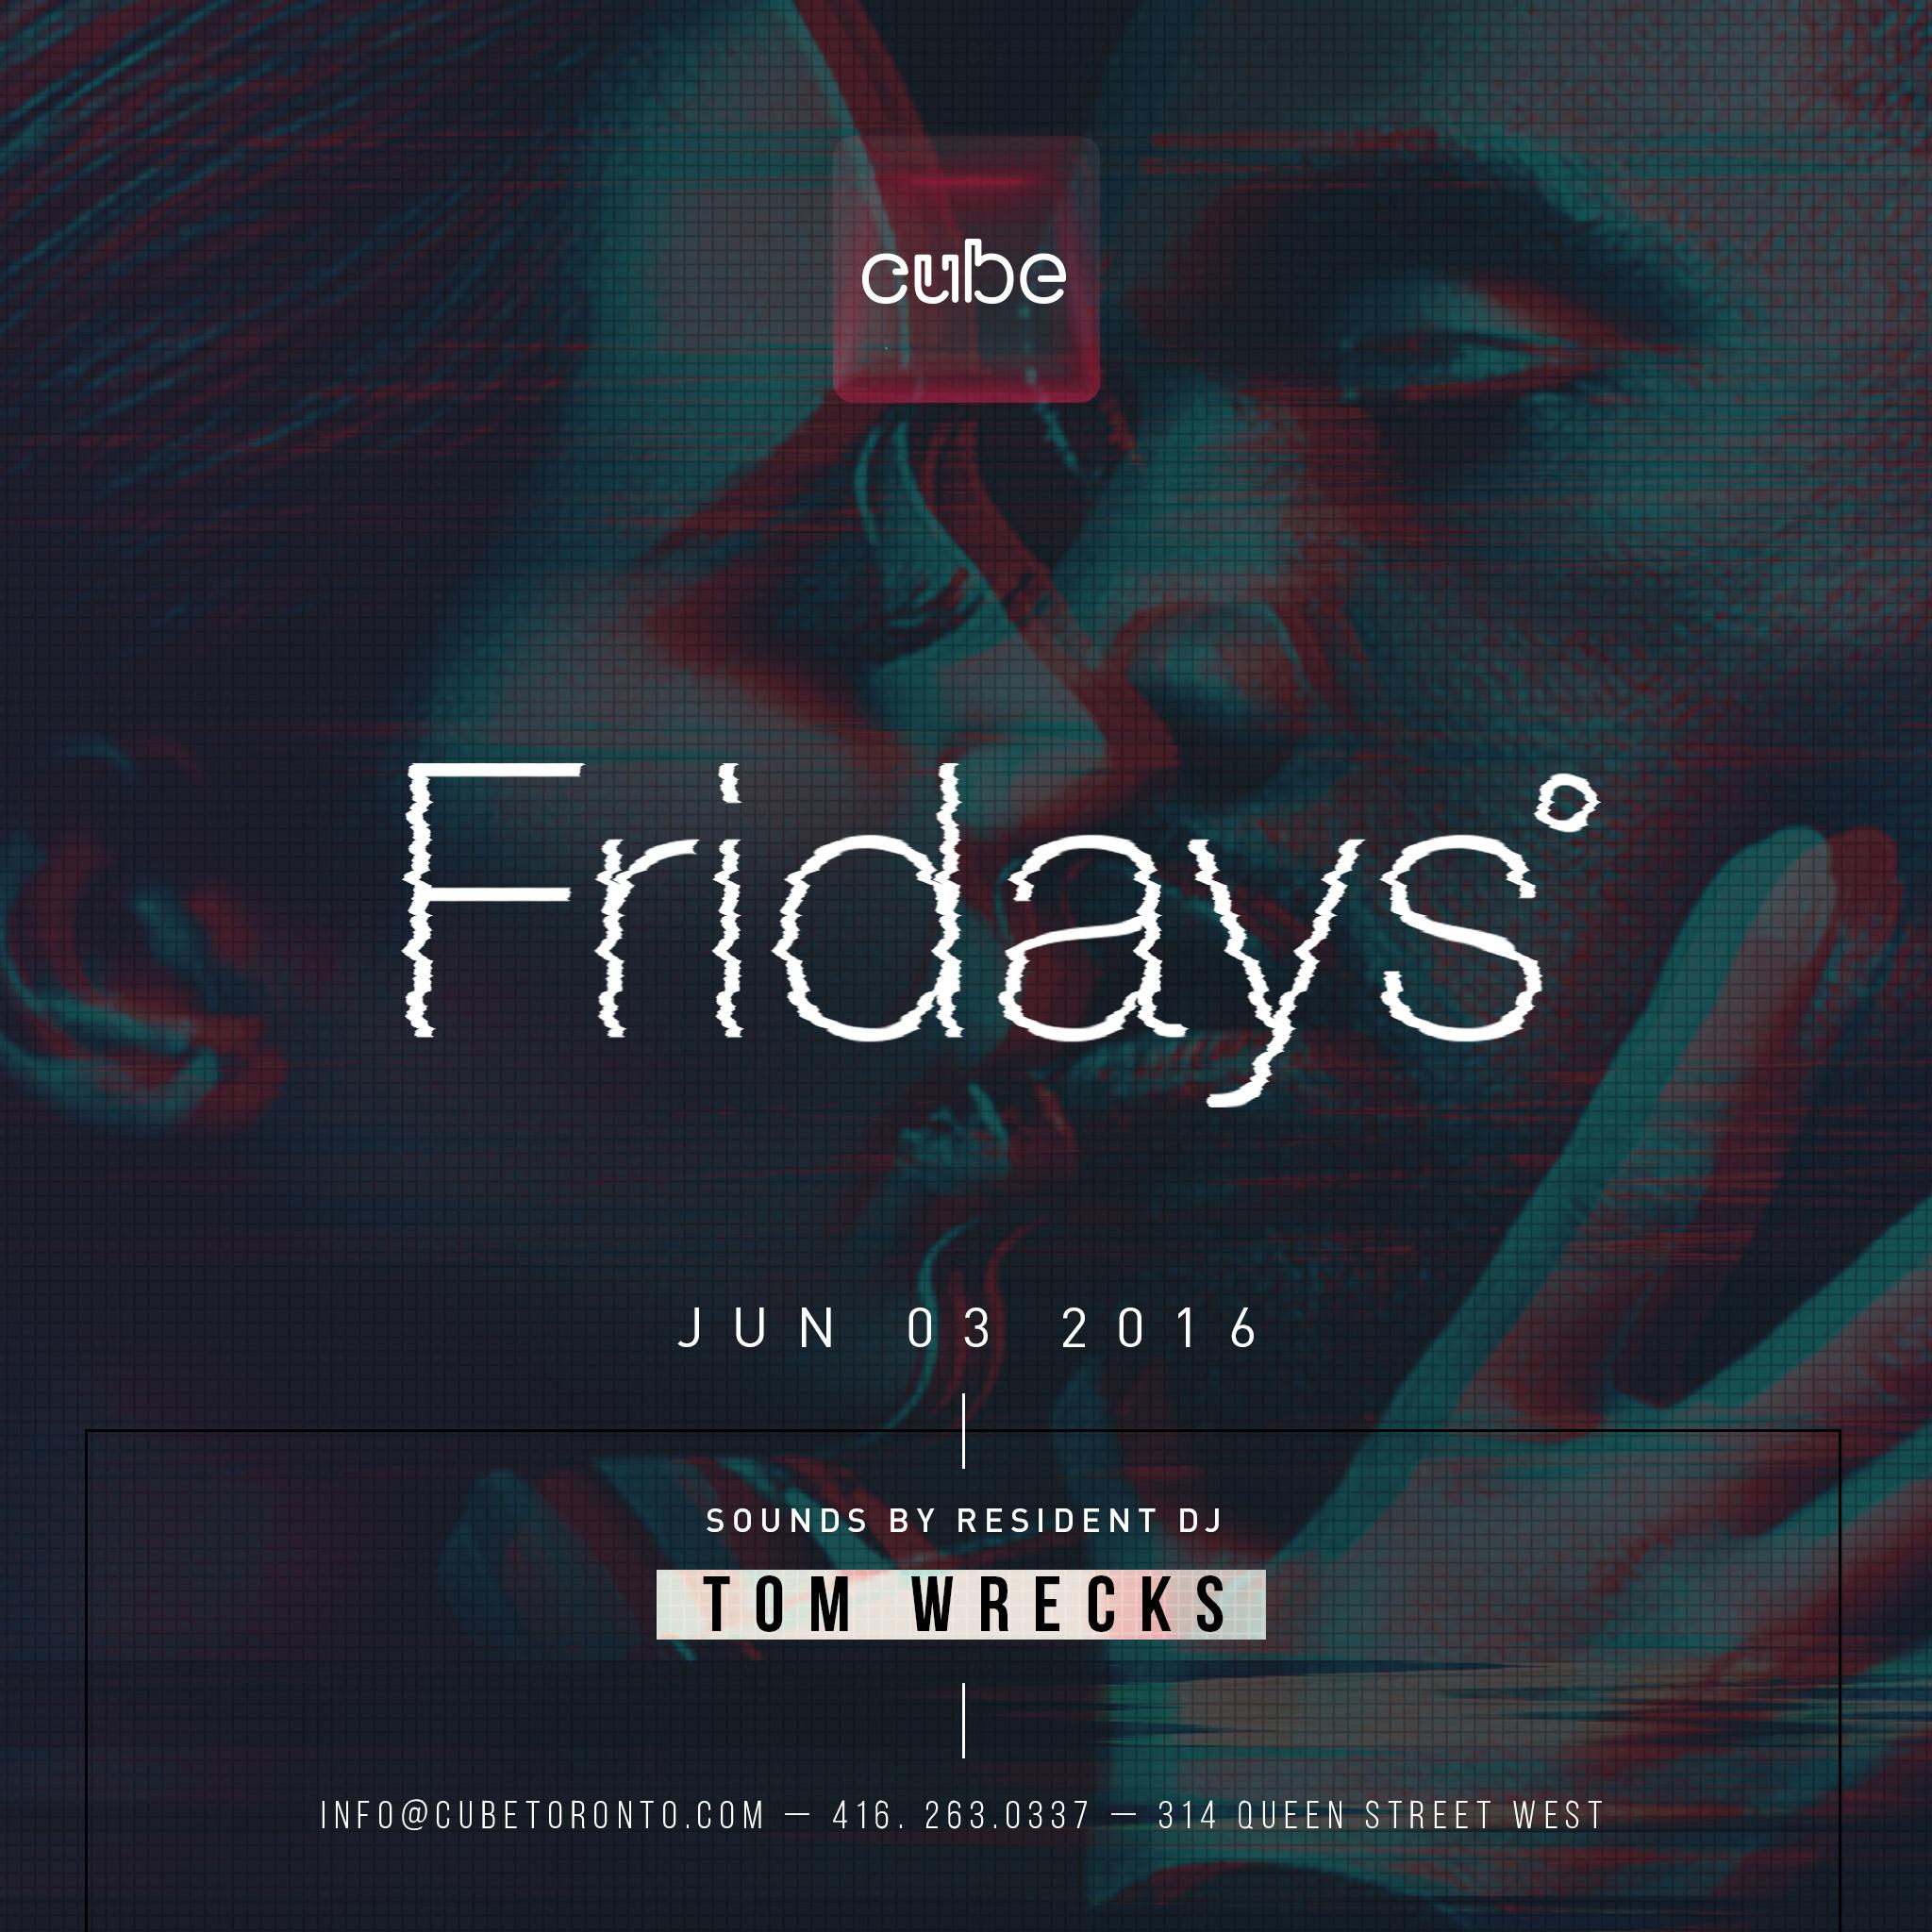 Cube Fridays